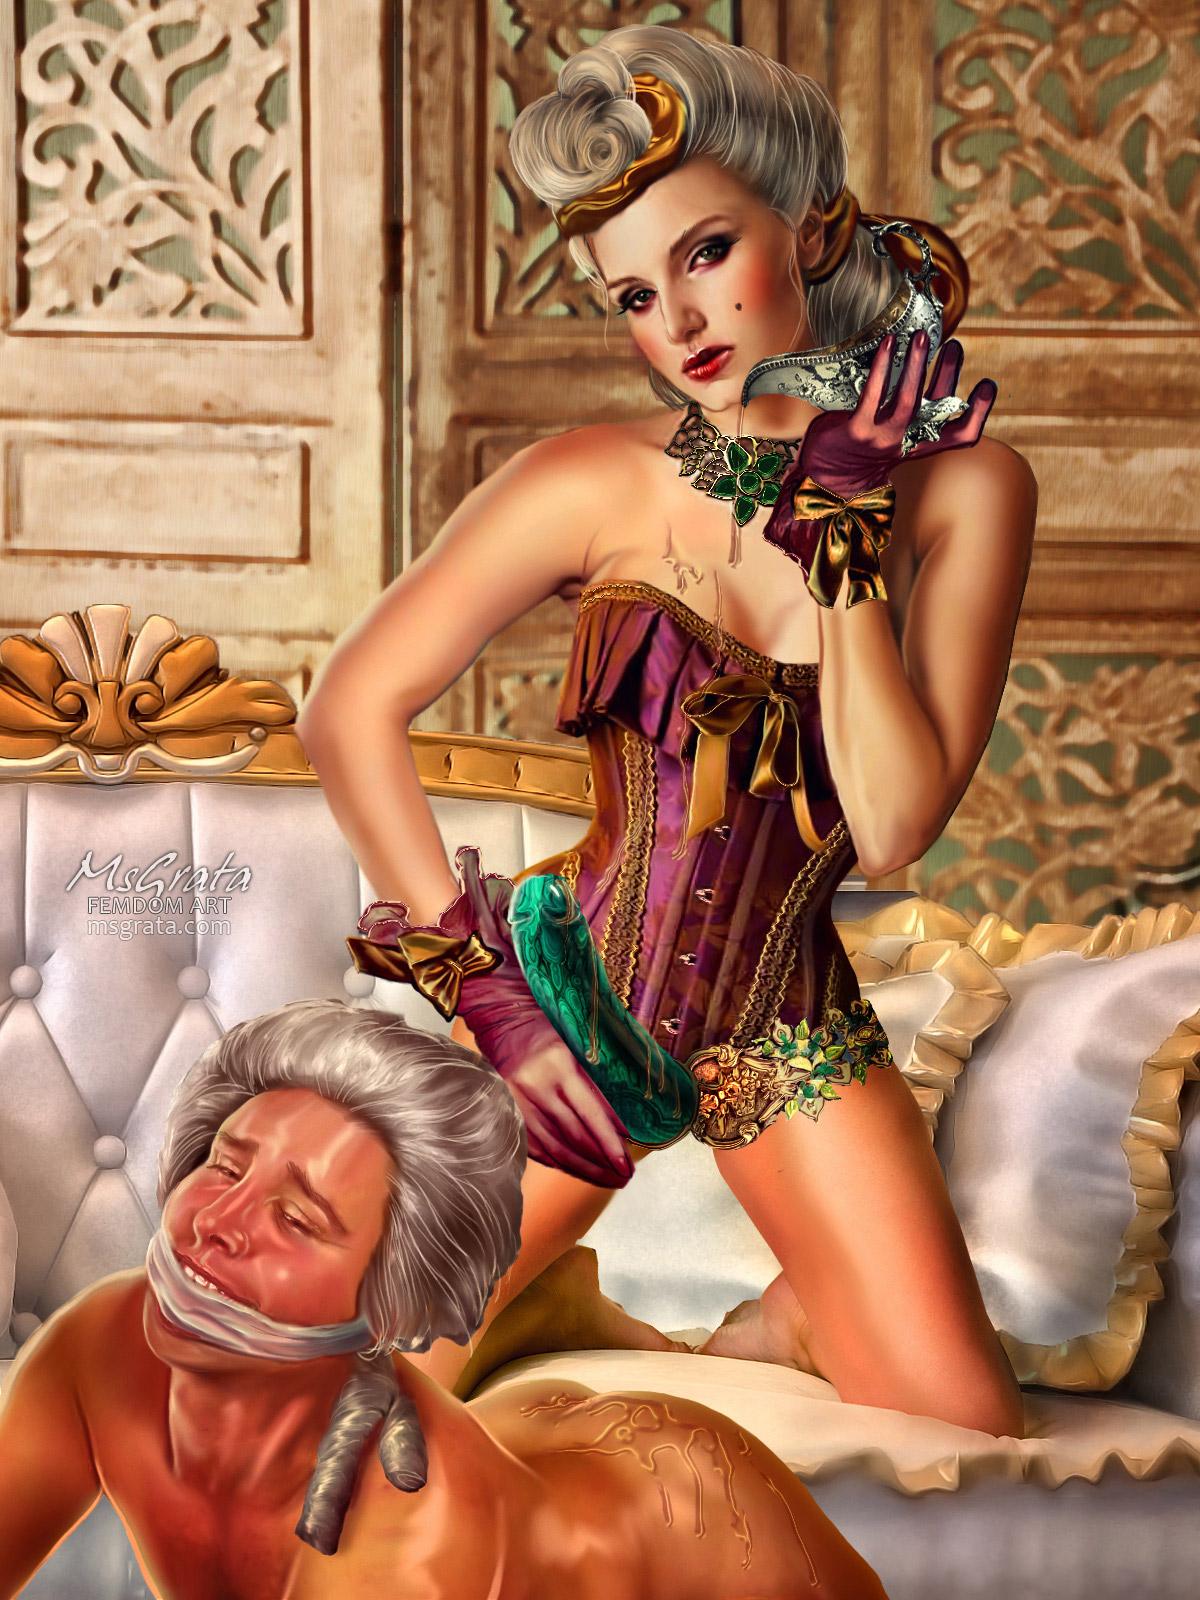 Medieval strap-on dildo pegging dominatrix MsGrata's femdom art fantasy